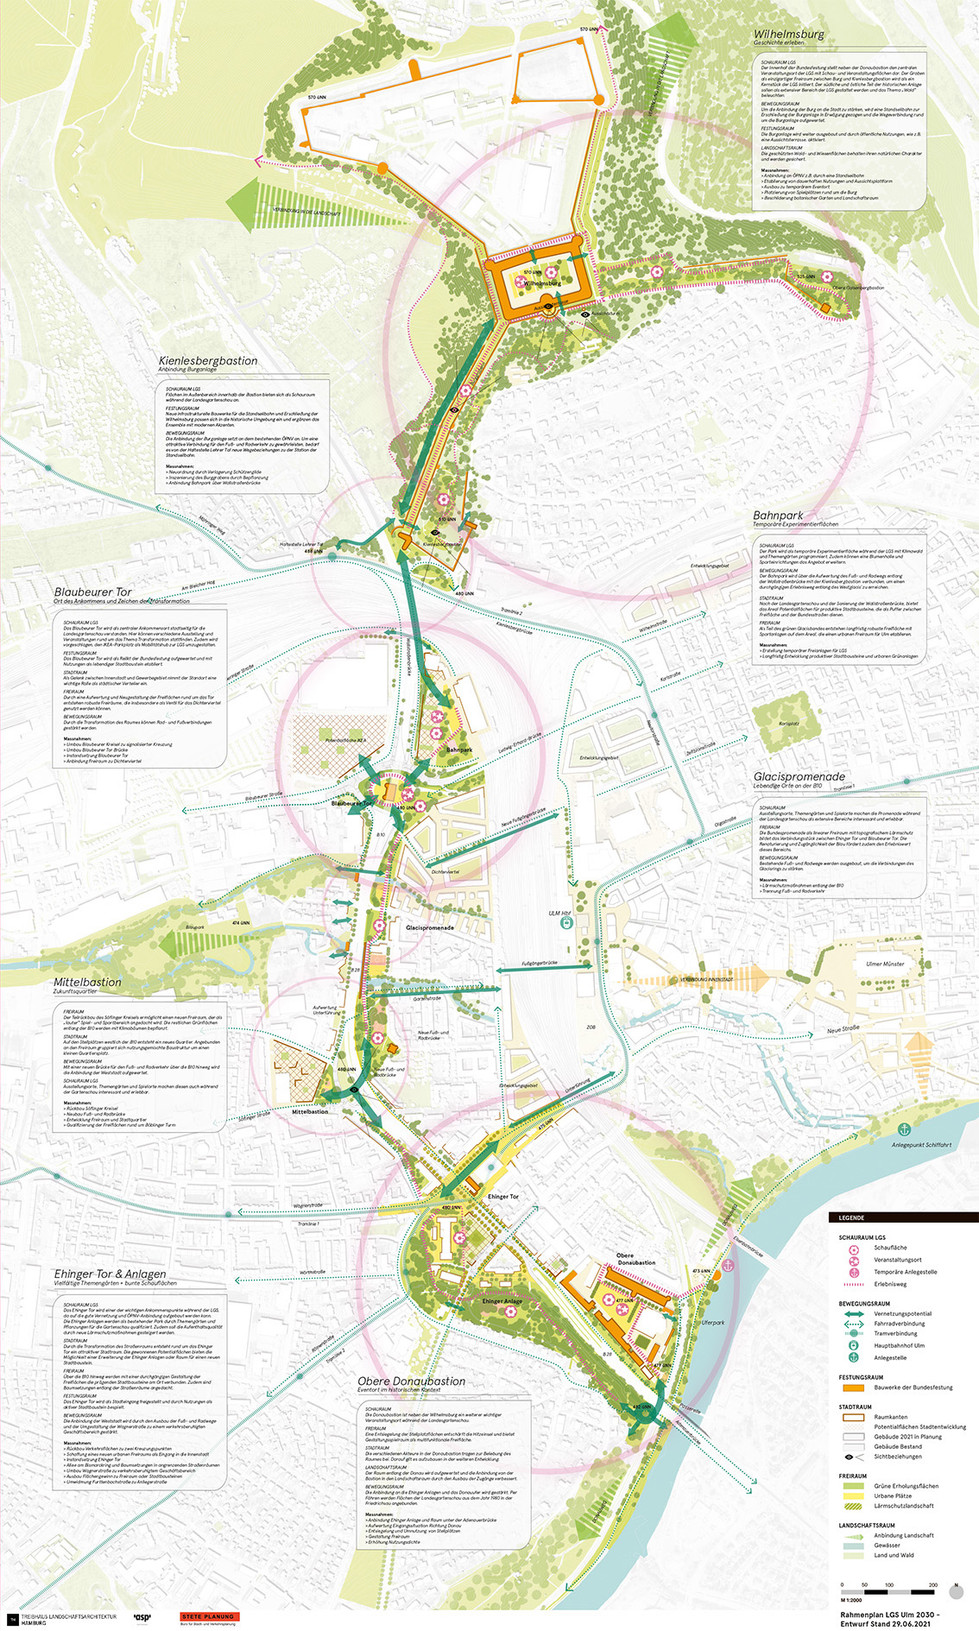 210921_ULM_Rahmenplan.jpg